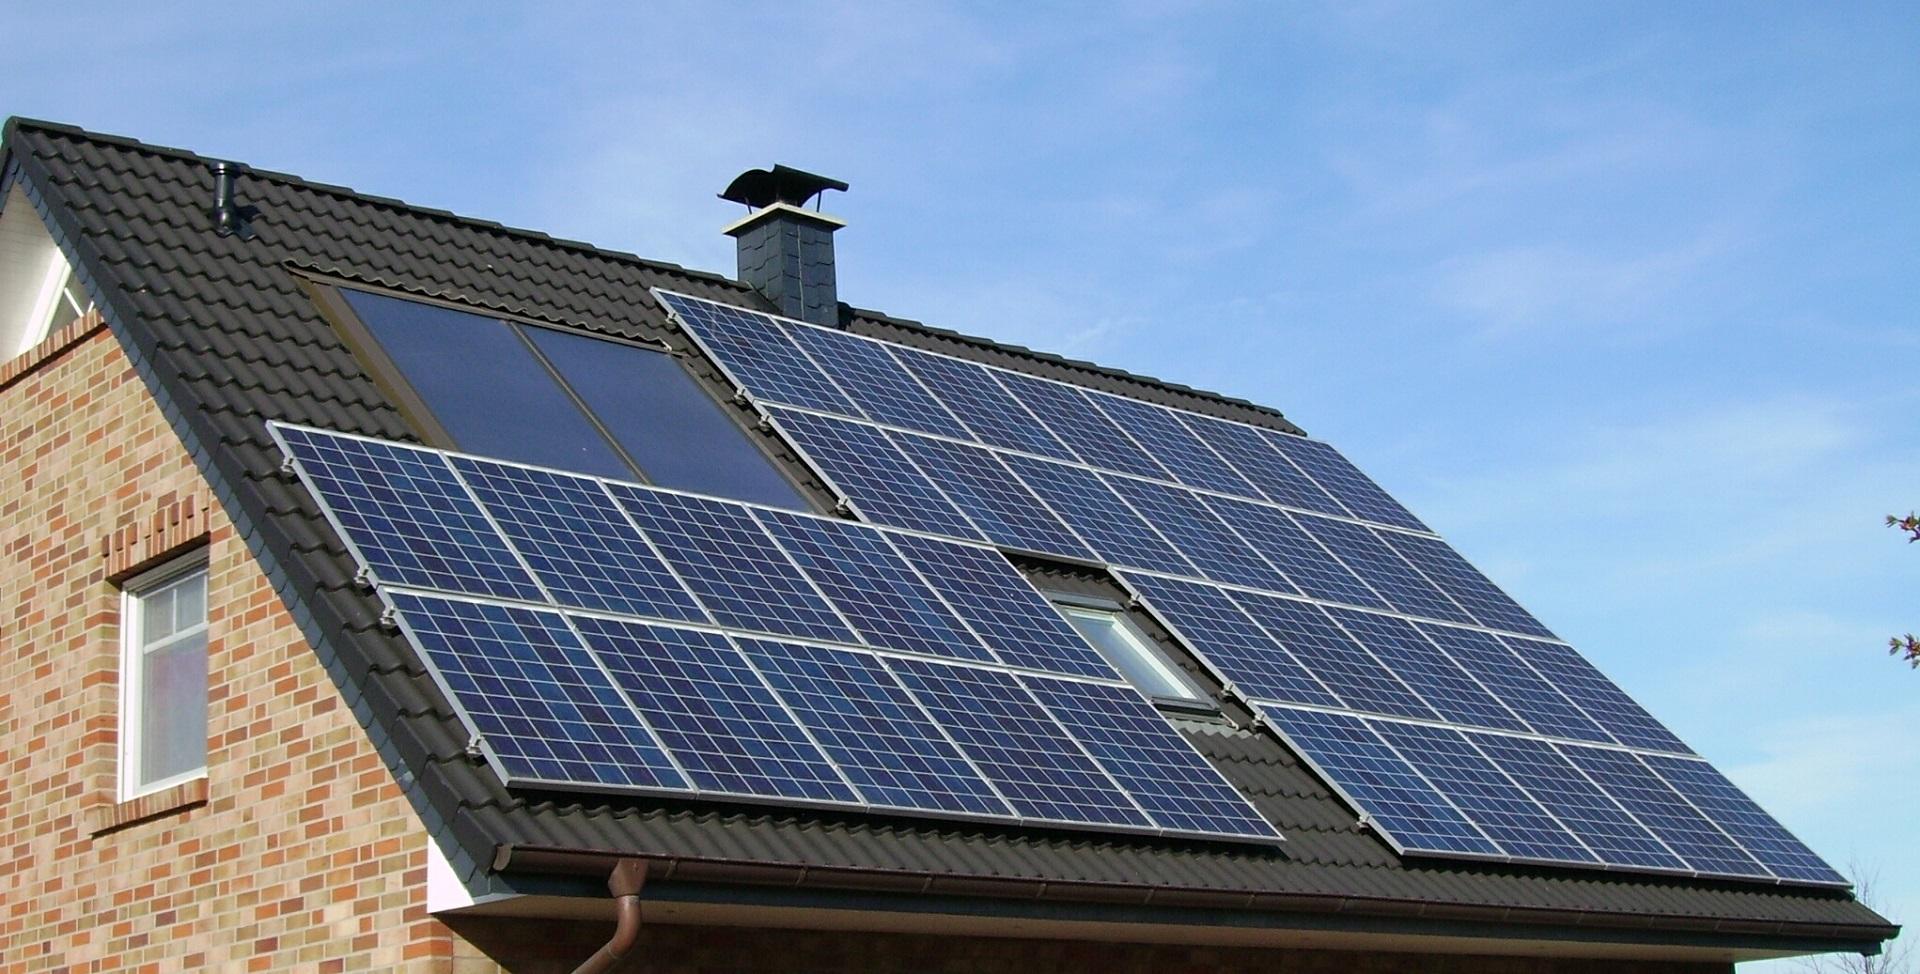 Impianti Fotovoltaici Busto Arsizio studio corti | the advantages of a photovoltaic system with